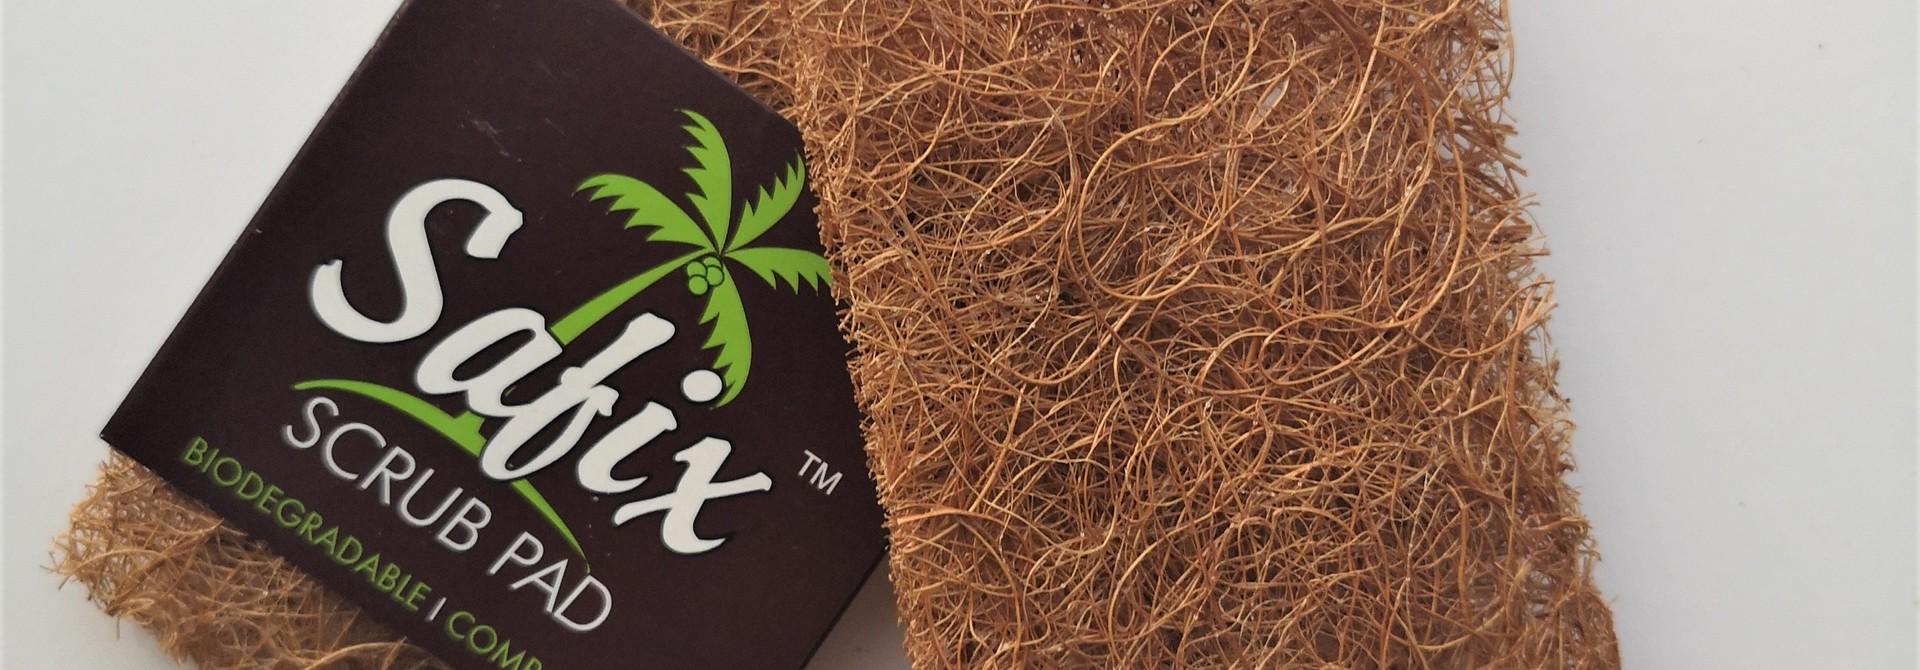 Krasvrije Schuurspons van kokosvezel